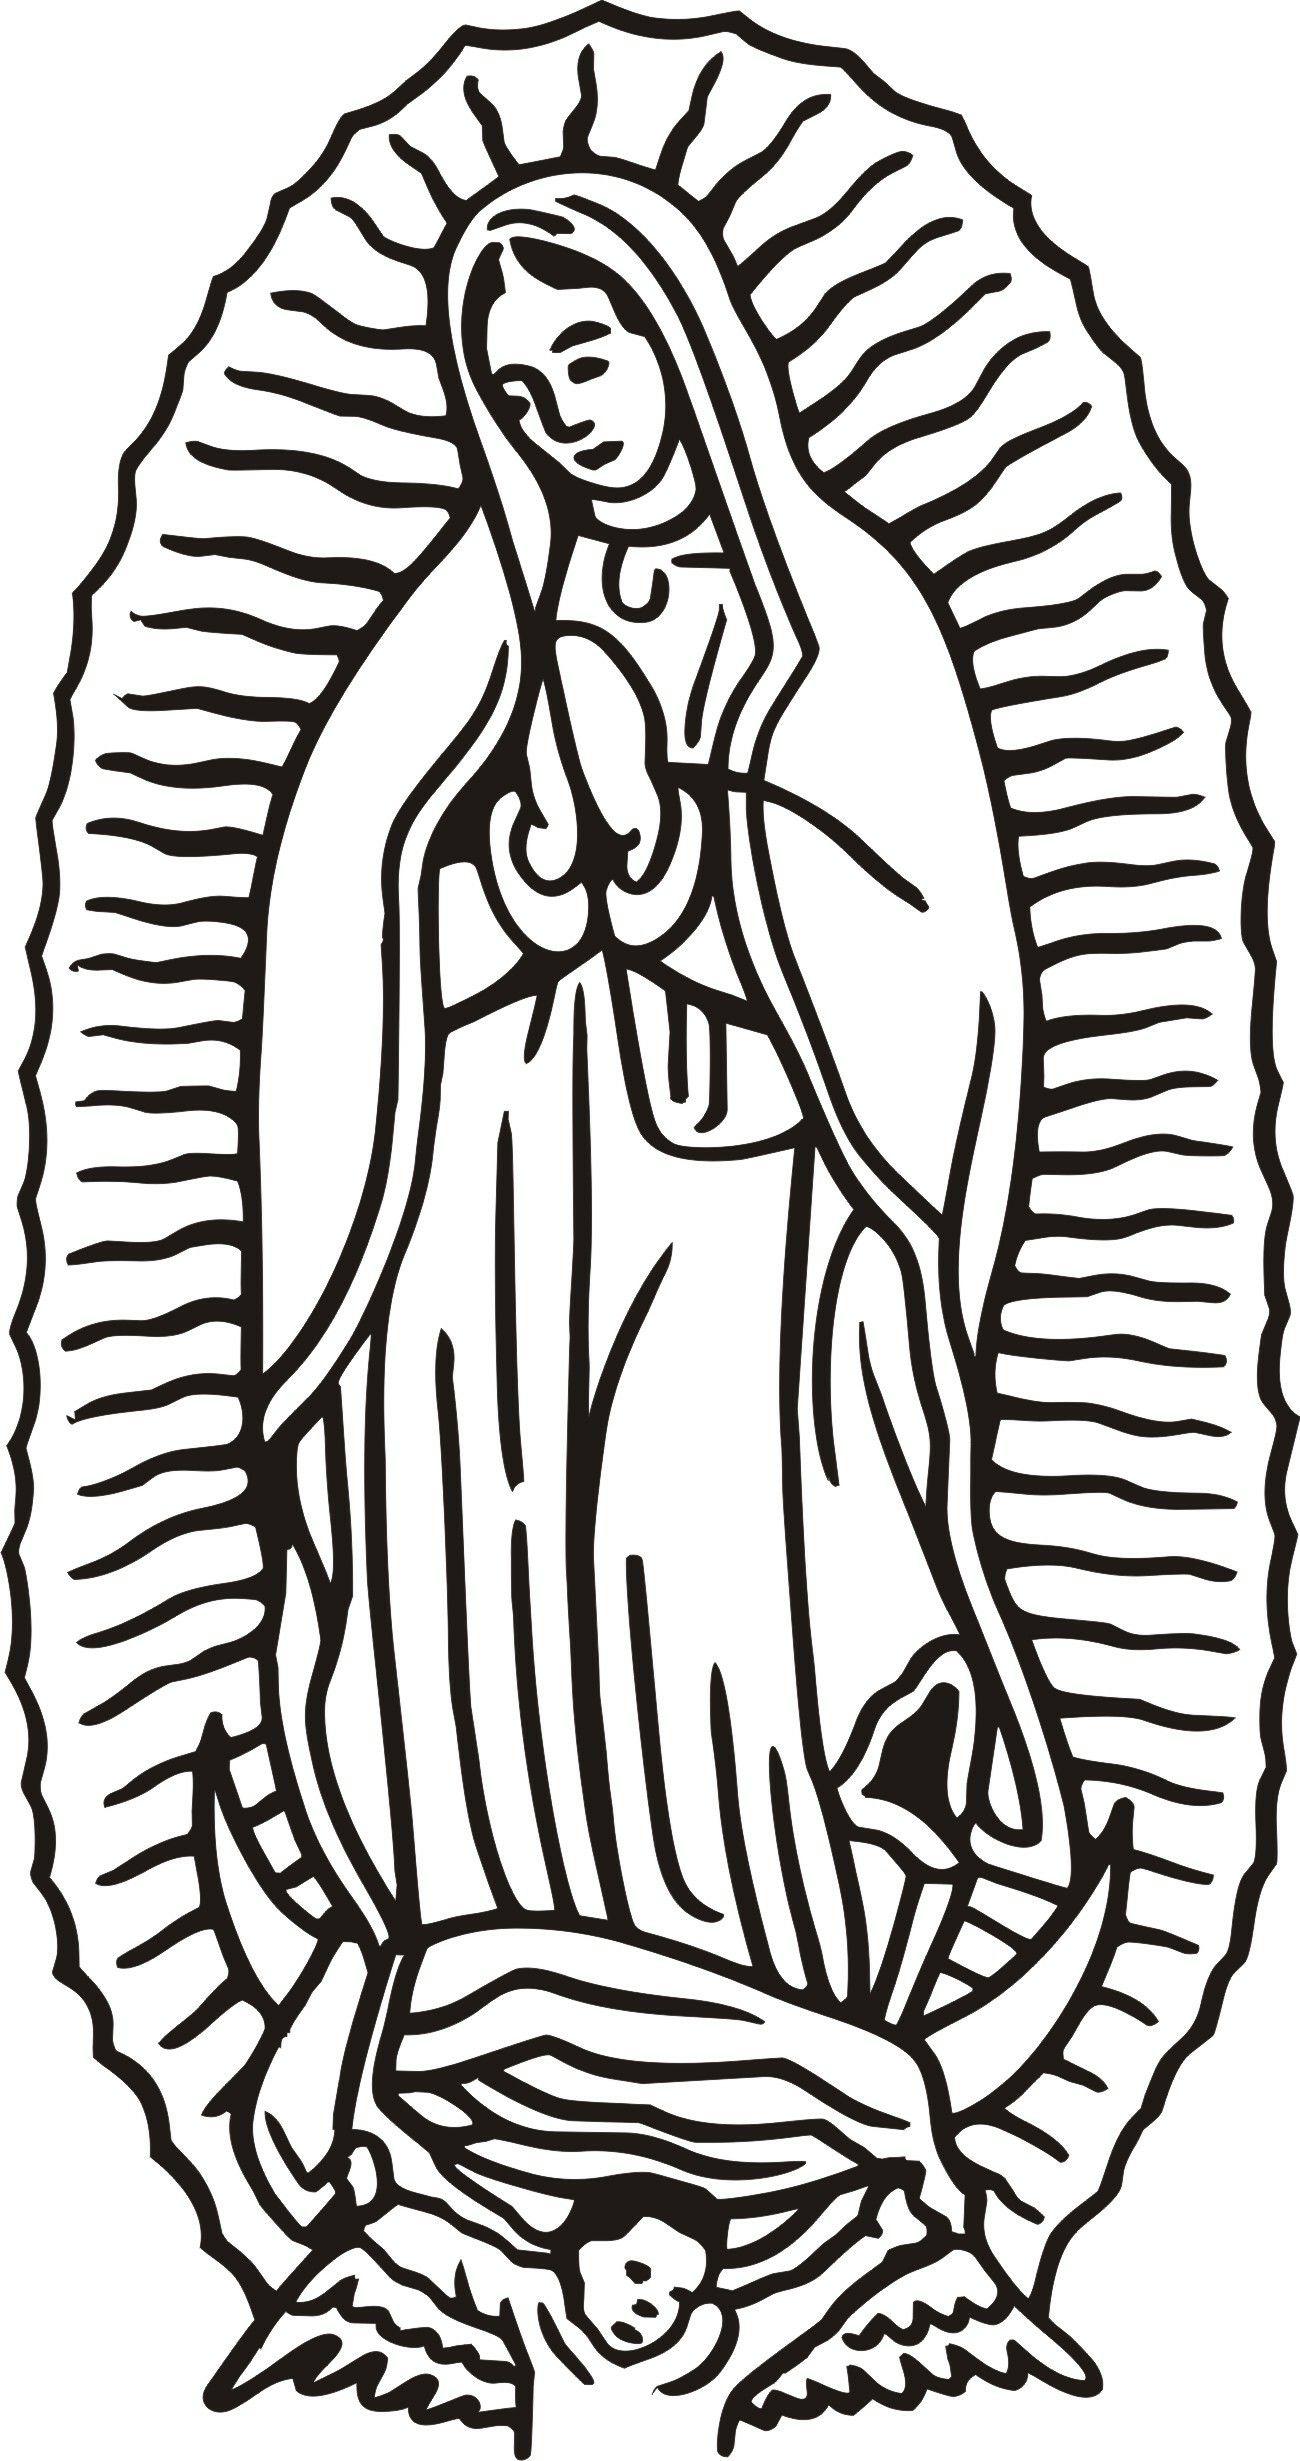 Our Lady Drawing Simple Drawings Art Art Drawings Simple